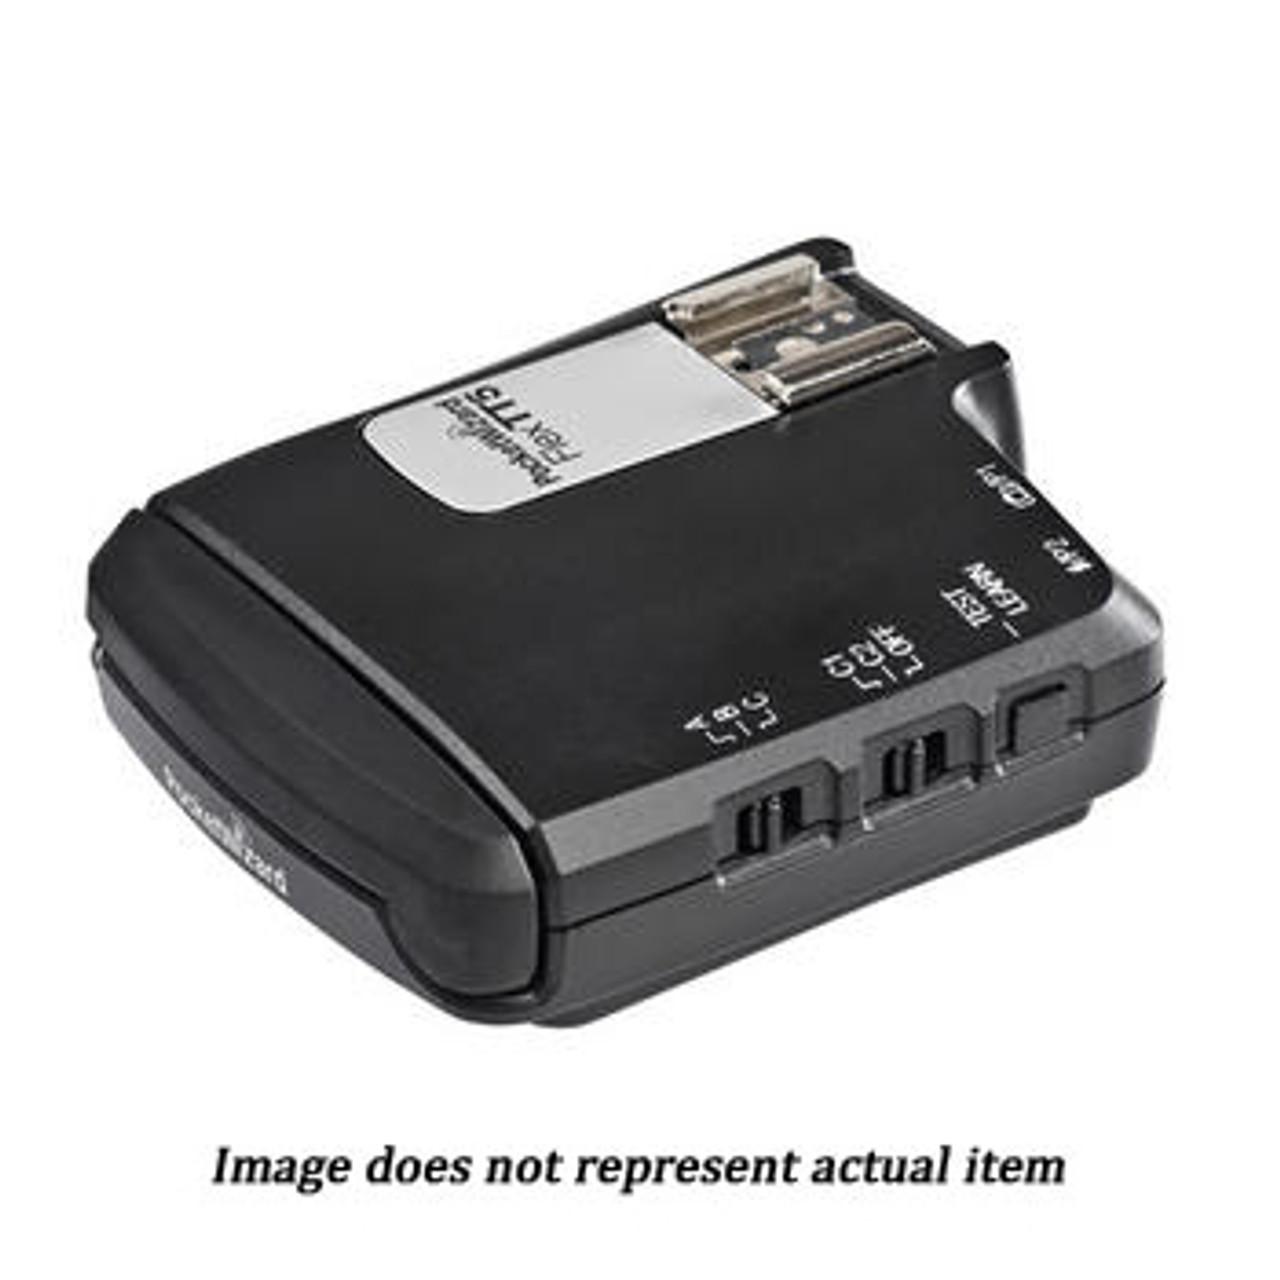 PocketWizard Flex TT5 Transceiver for Canon (USED) - S/N 5CU121695